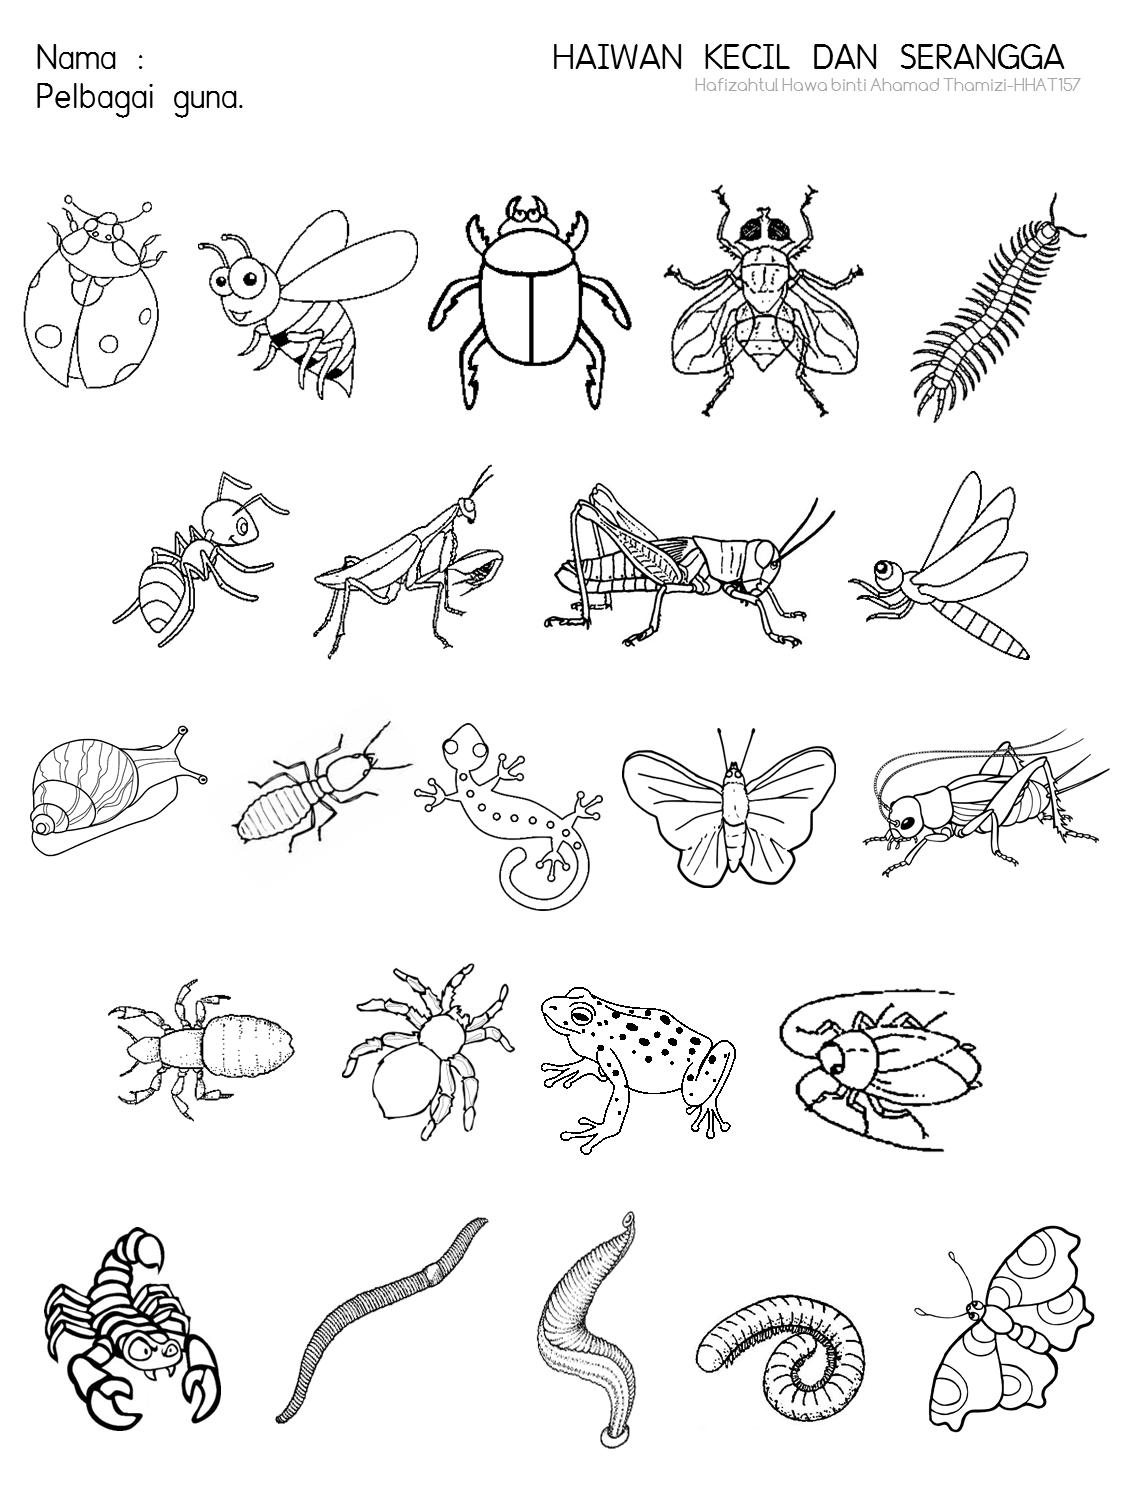 Cikgu Fieza Hhat157 Haiwan Kecil Amp Serangga